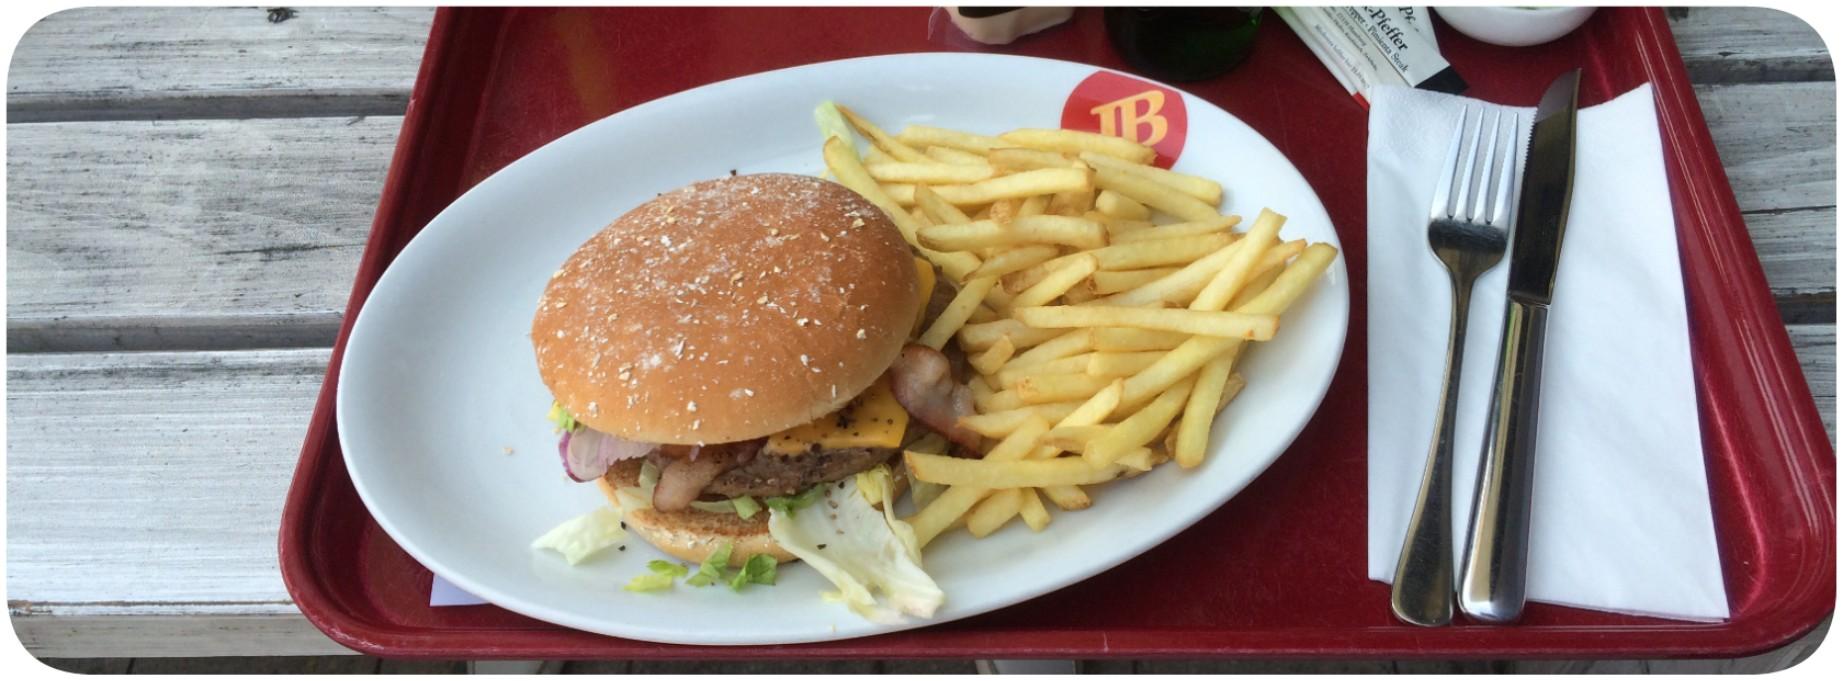 Folge341_ McDonalds